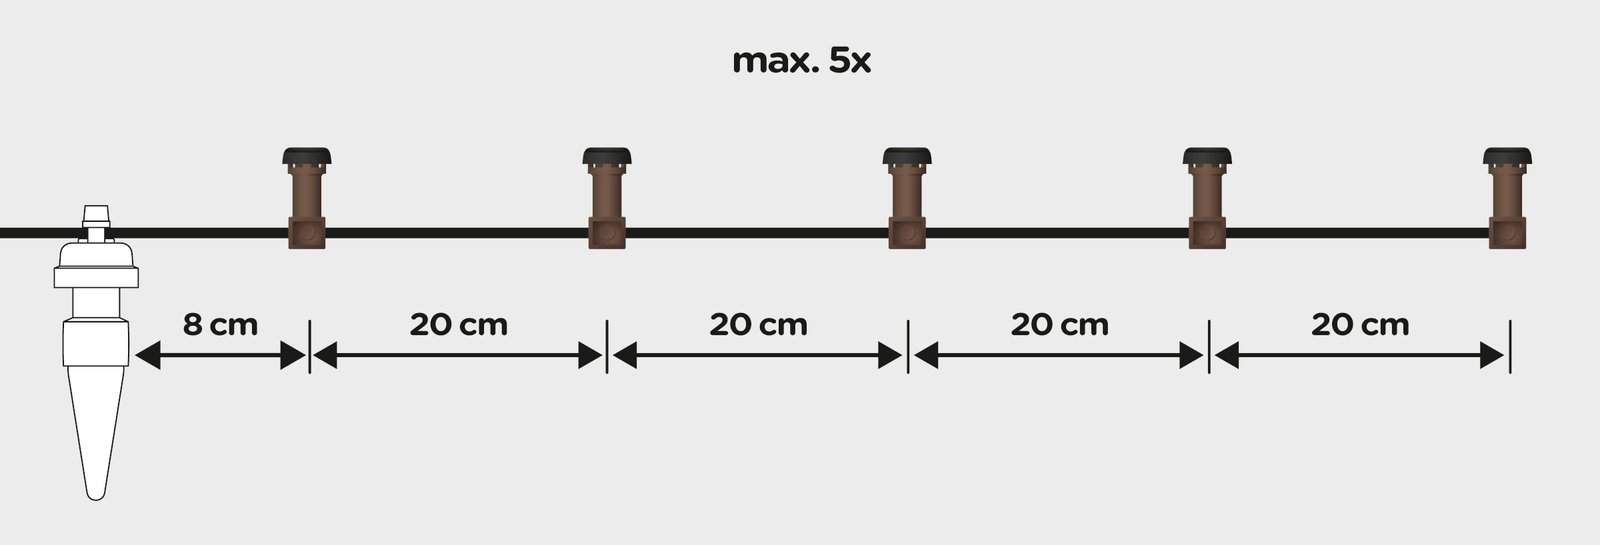 Blumat dripper installation diagram